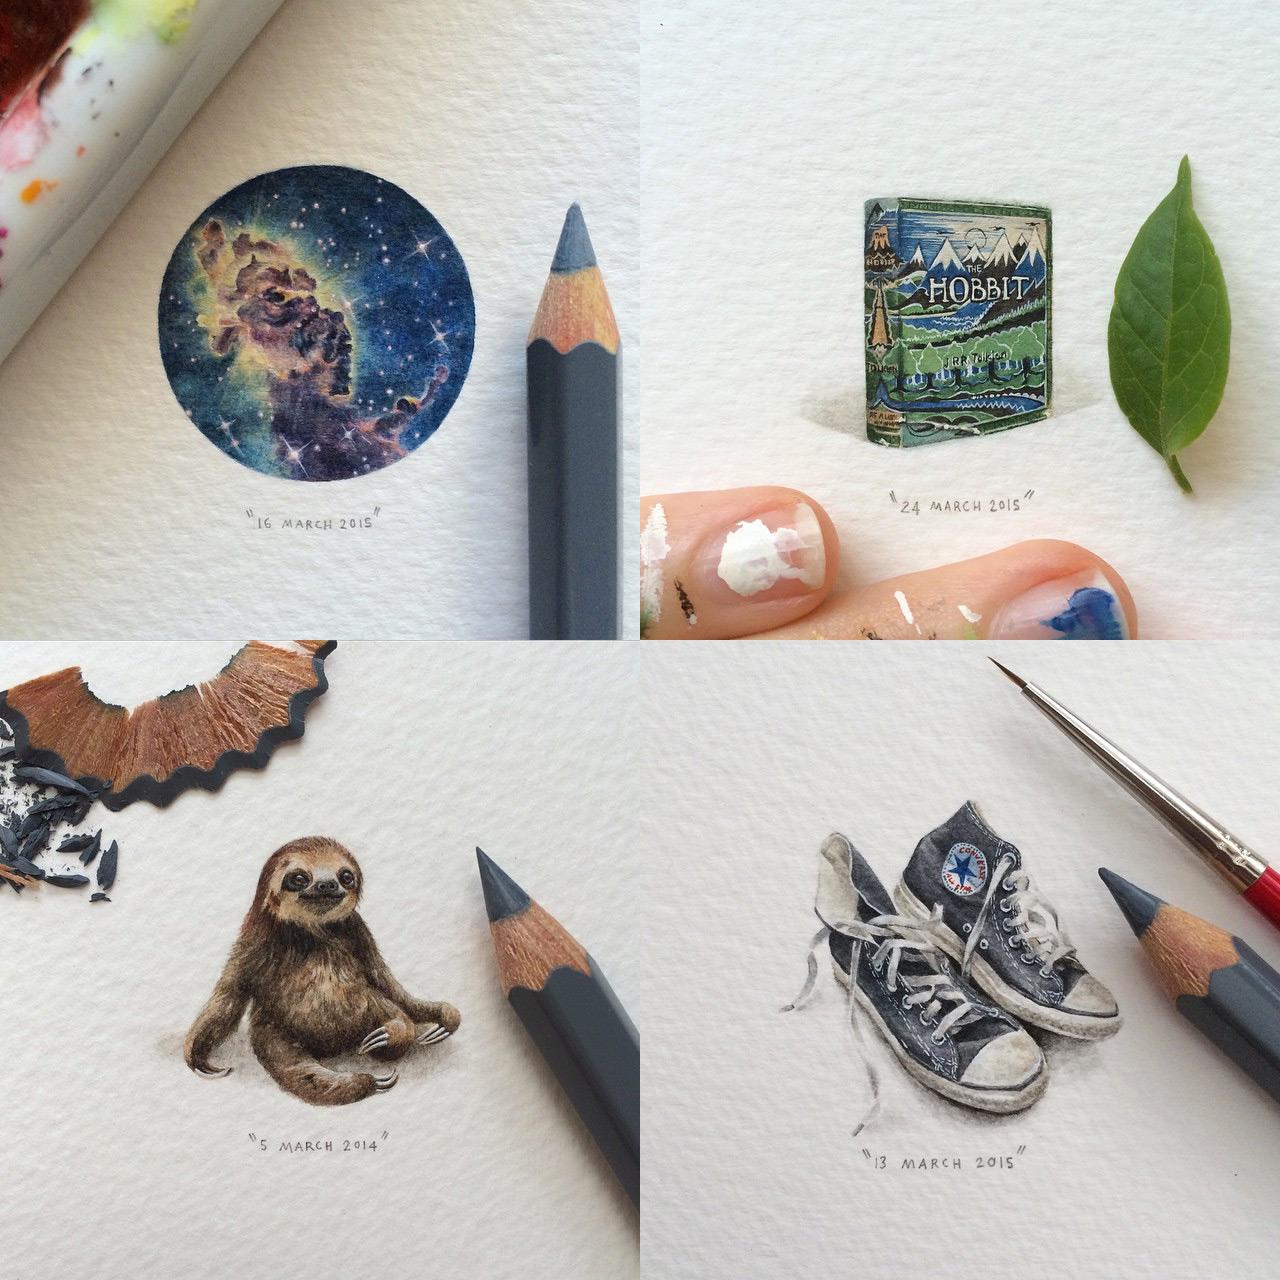 Arte em miniatura por Lorraine Loots (9 pics)